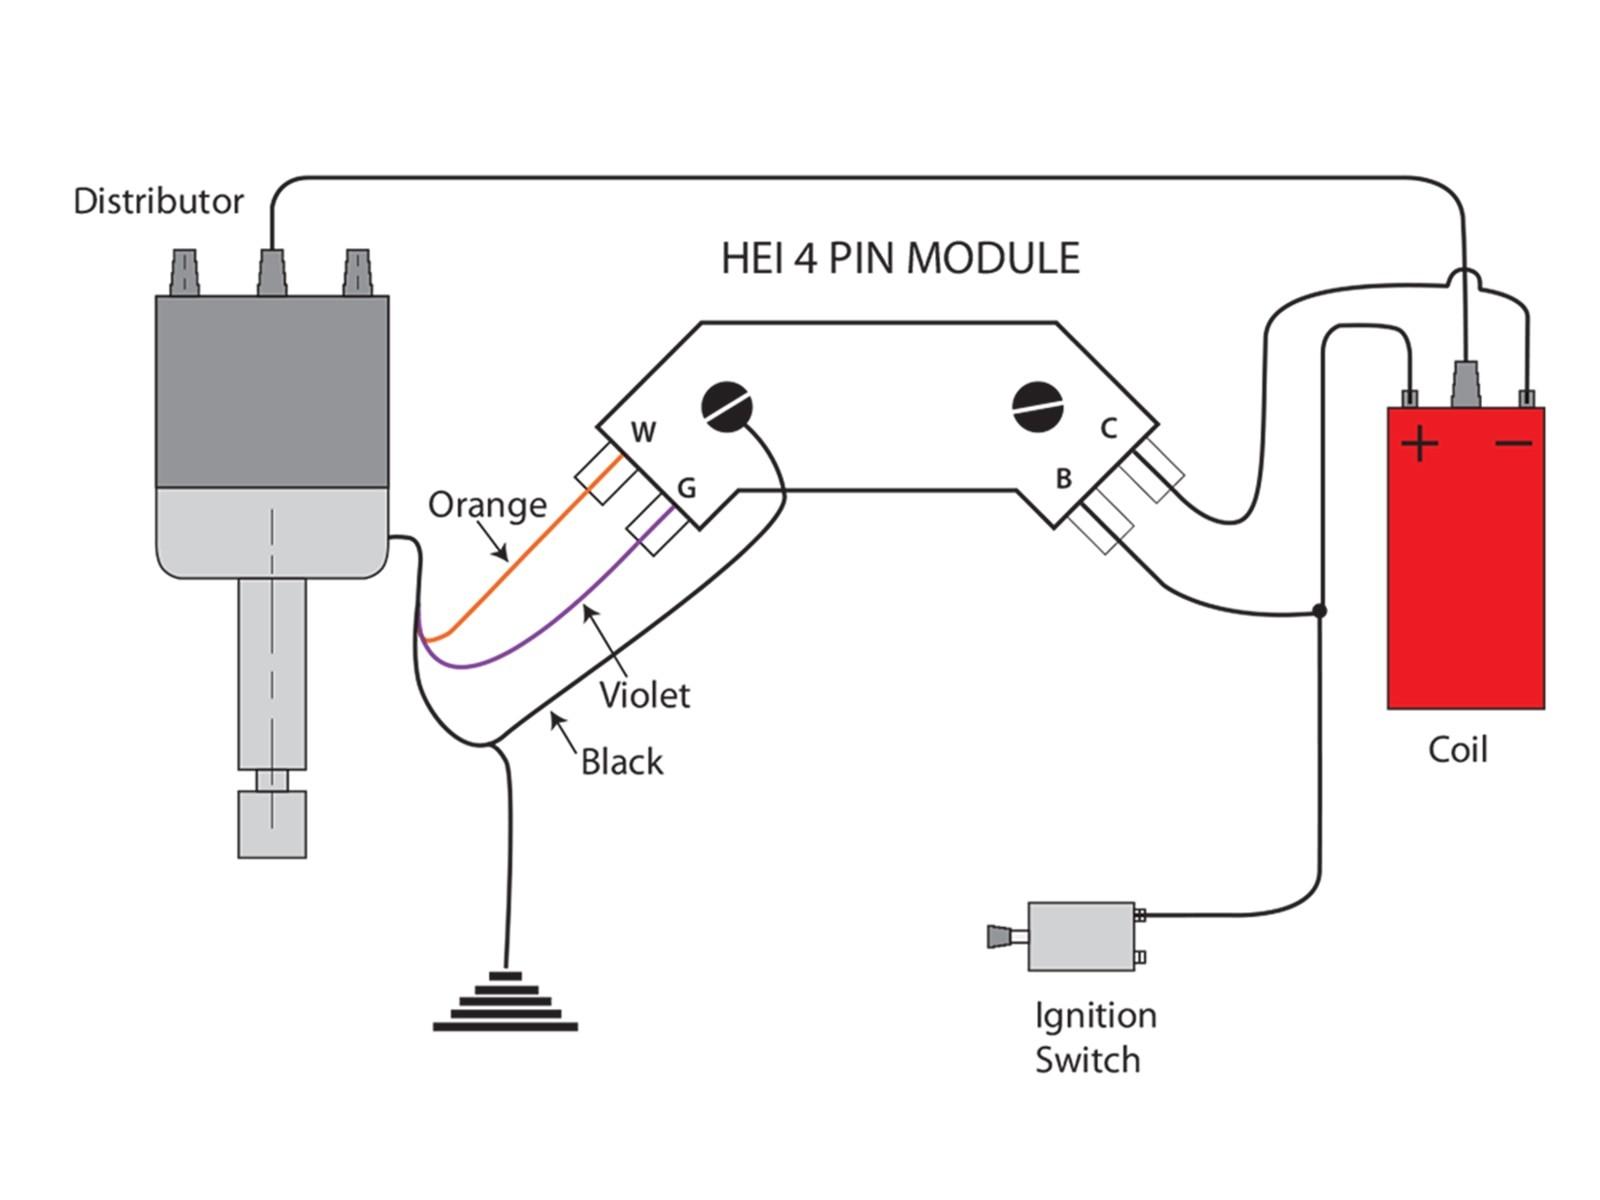 Diy Hemi Wirig 5.7 Dirgam 5 7 Hemi Coil Conversion Wiring Diagram Of Diy Hemi Wirig 5.7 Dirgam